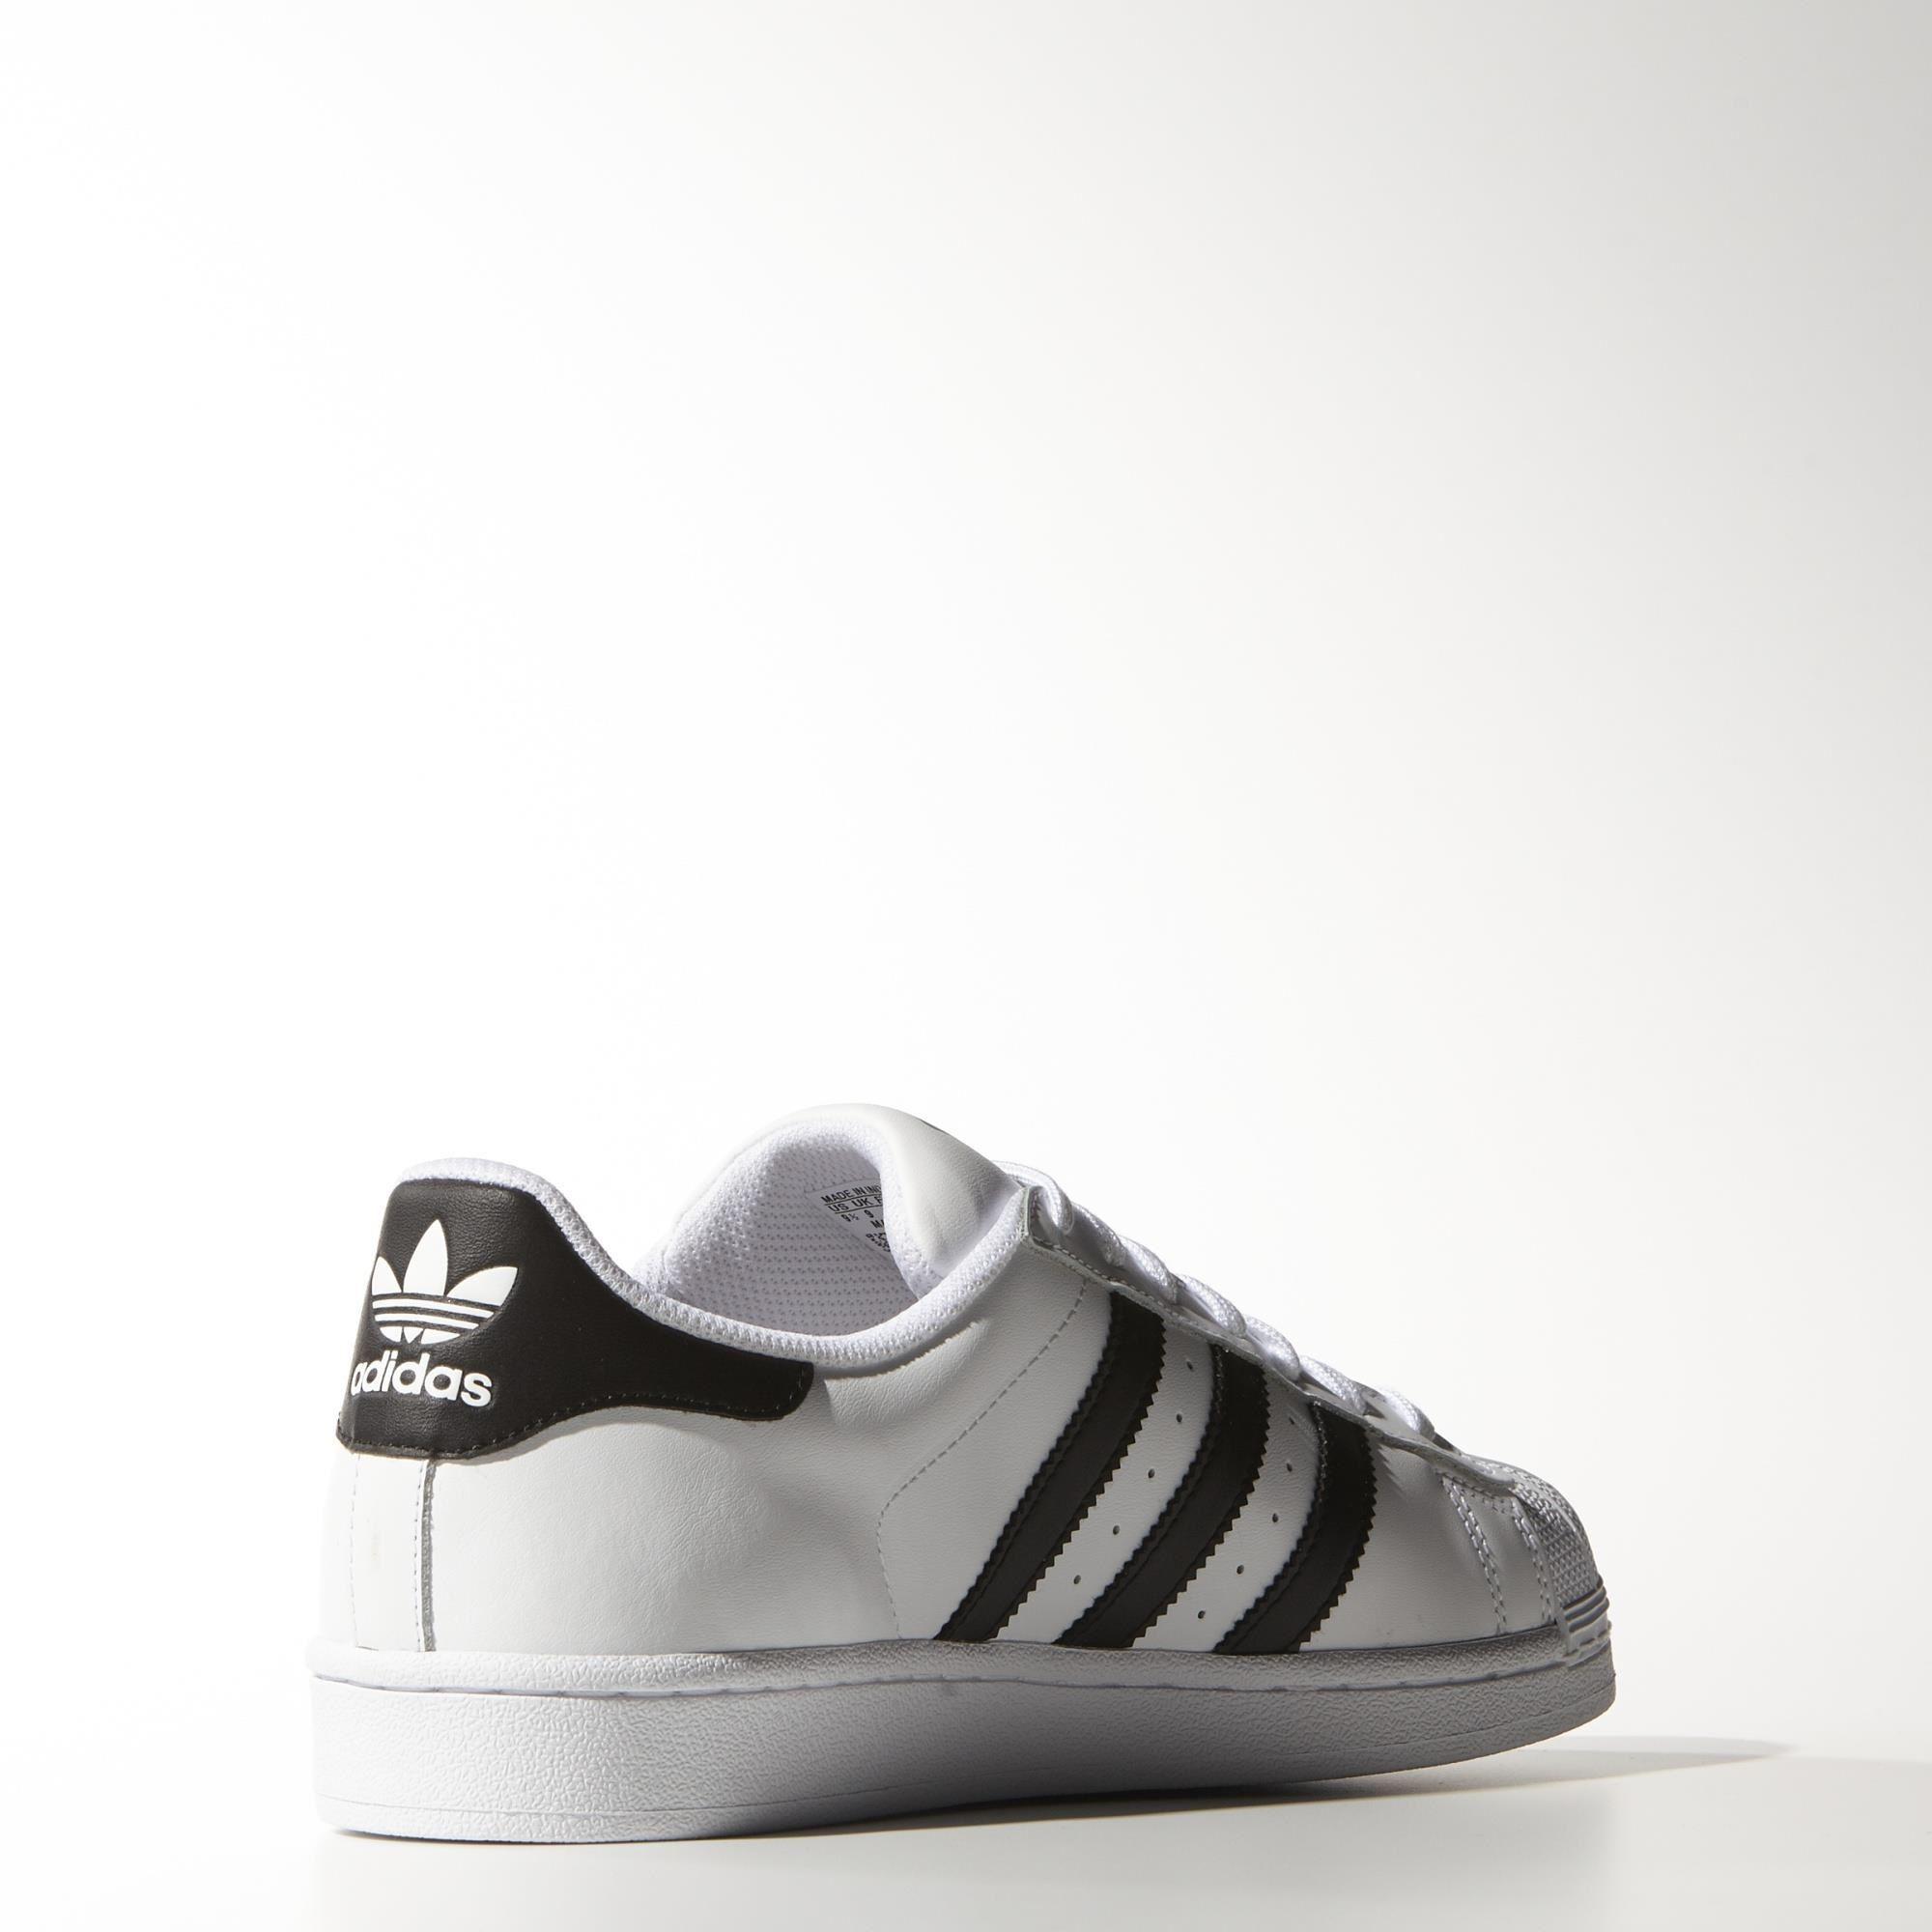 5e7e8 Hot C5fbe Adidas Superstar Foundation Hrvatska dhrsCQtxB